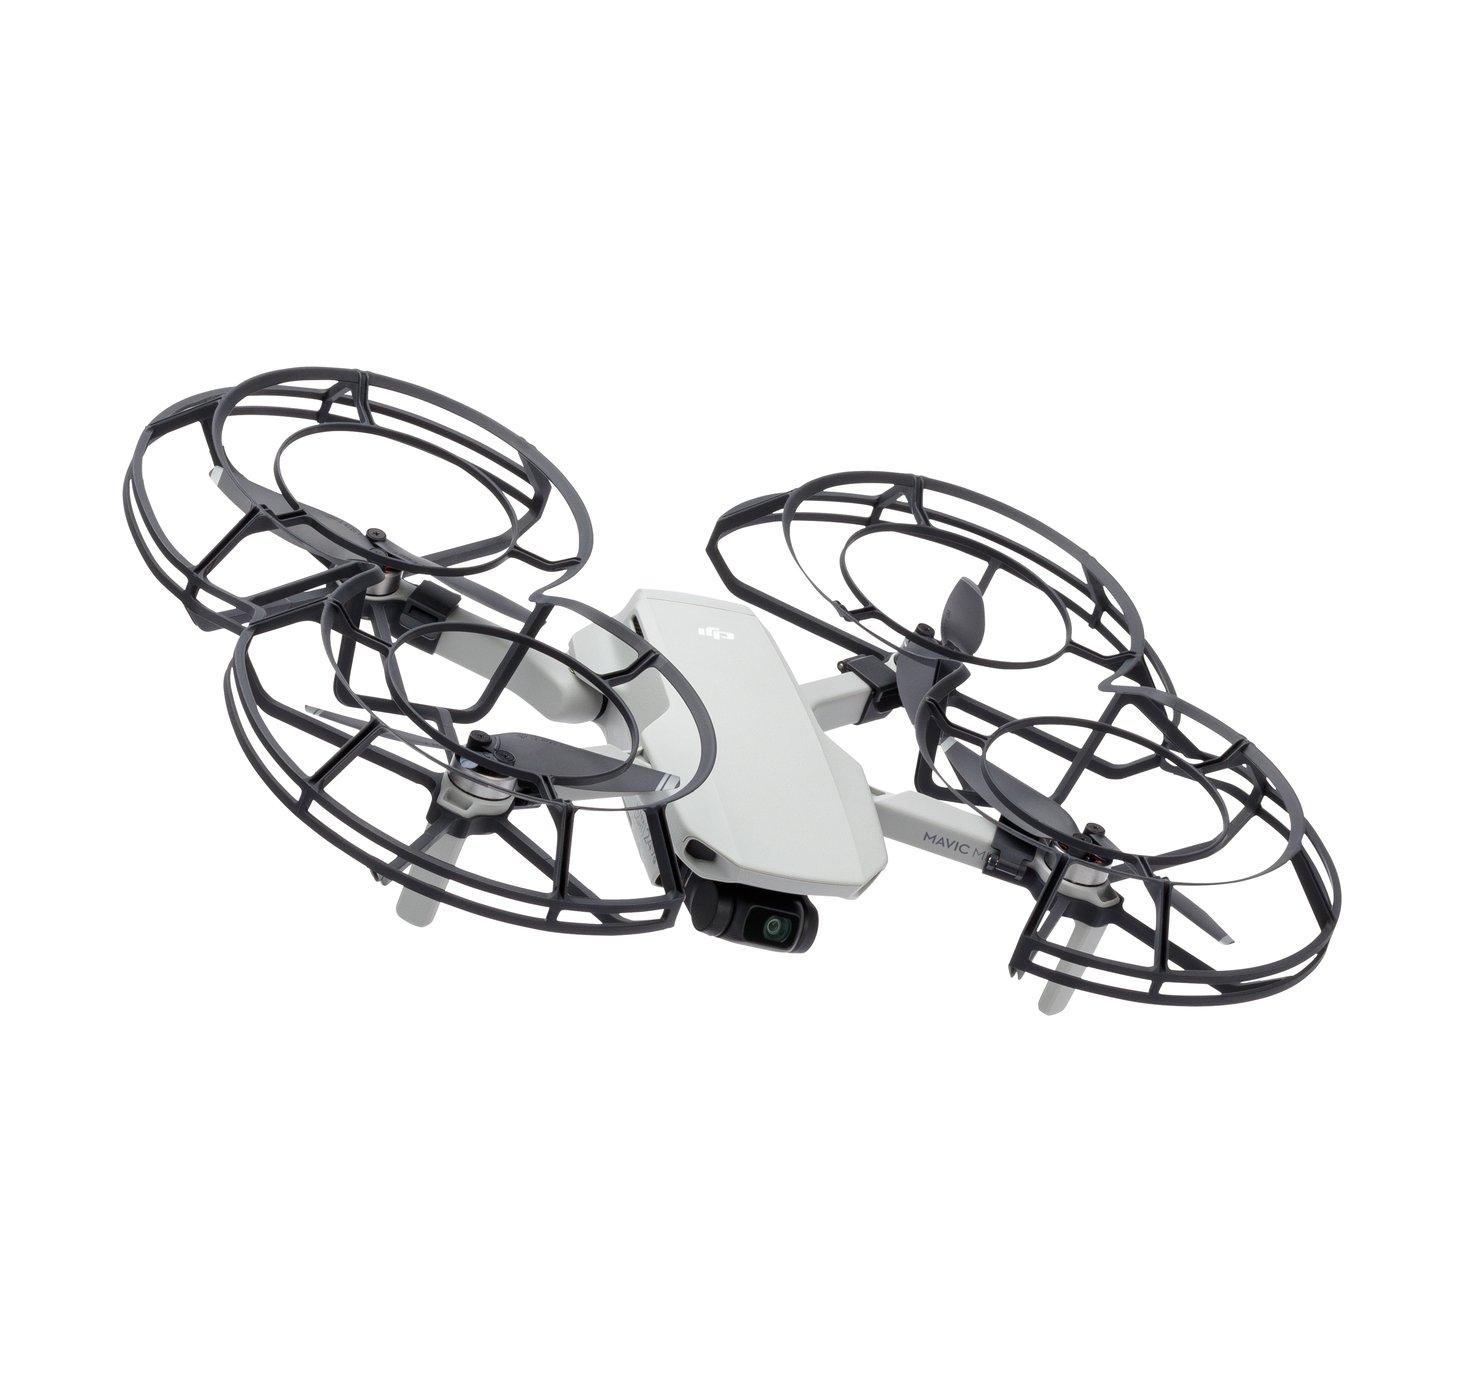 DJI Mavic Mini Fly More Drone Combo